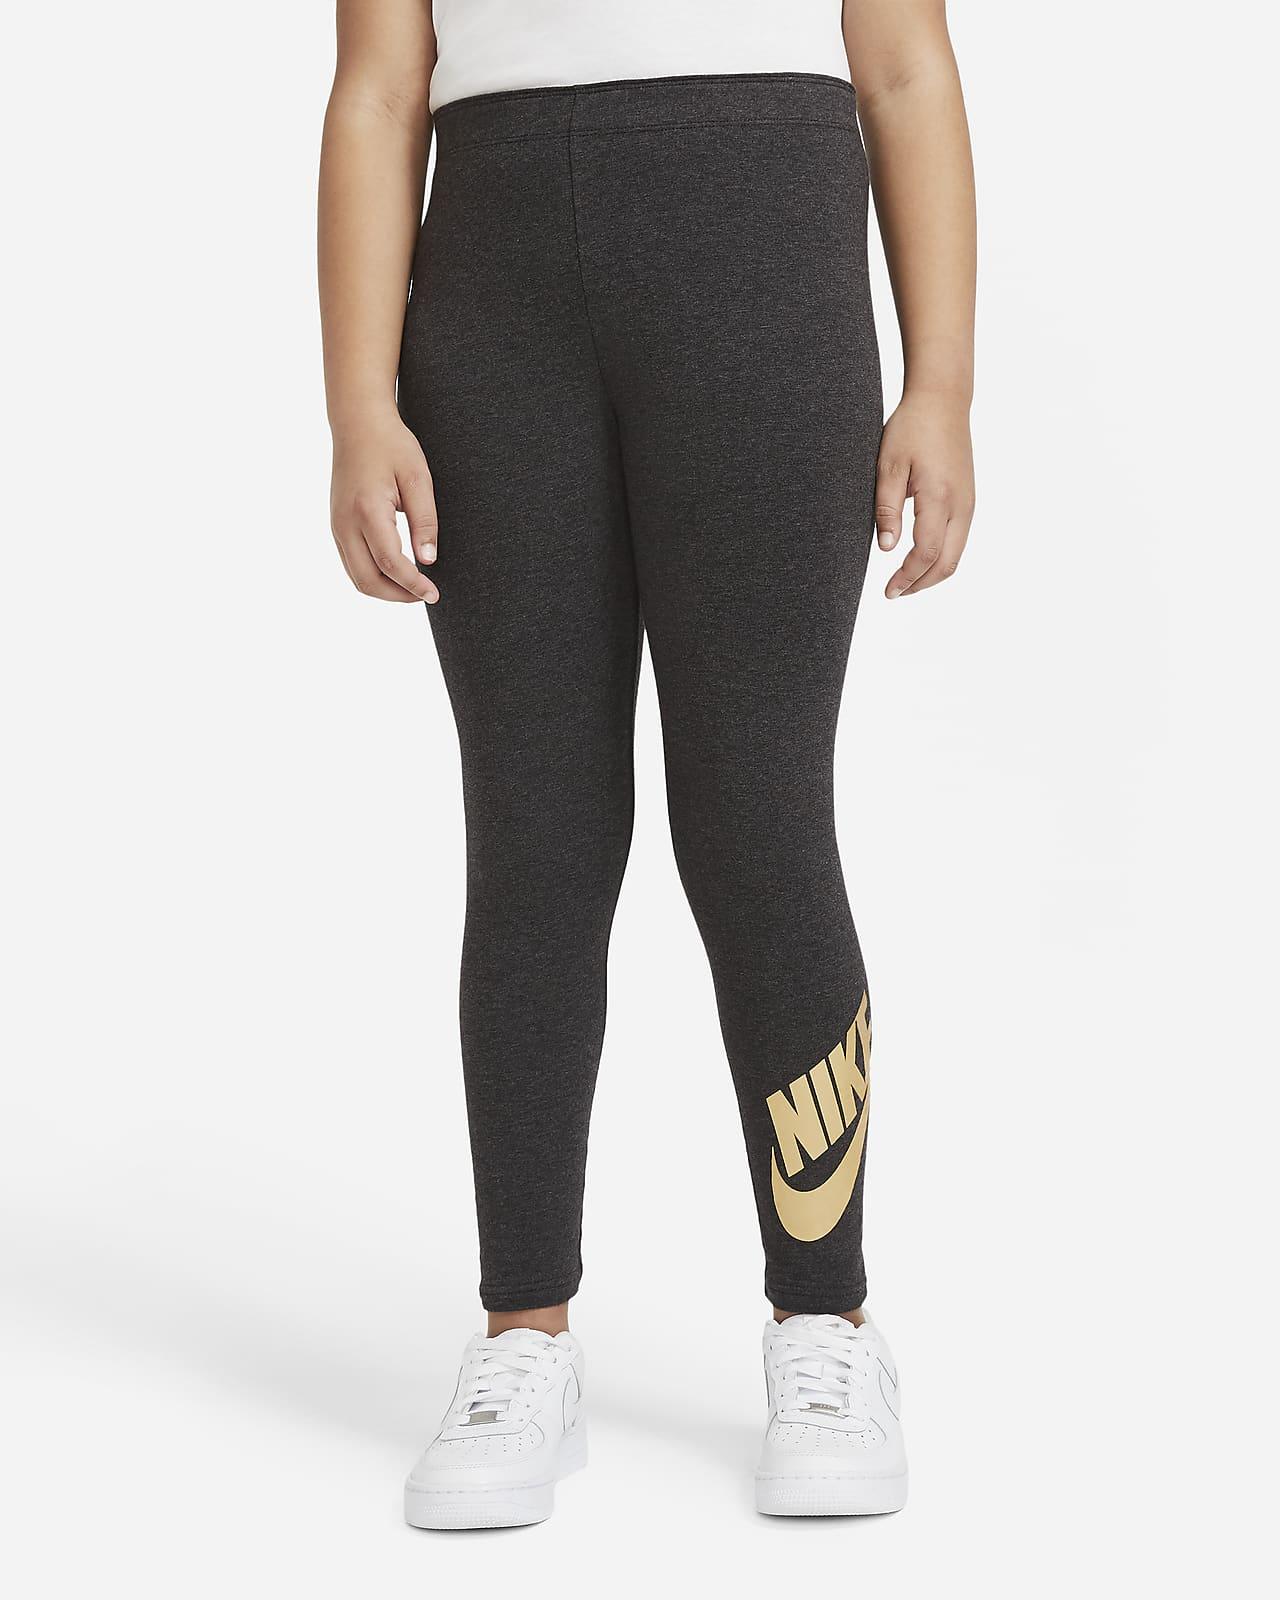 Nike Sportswear Favourites Older Kids' (Girls') Leggings (Extended Size)